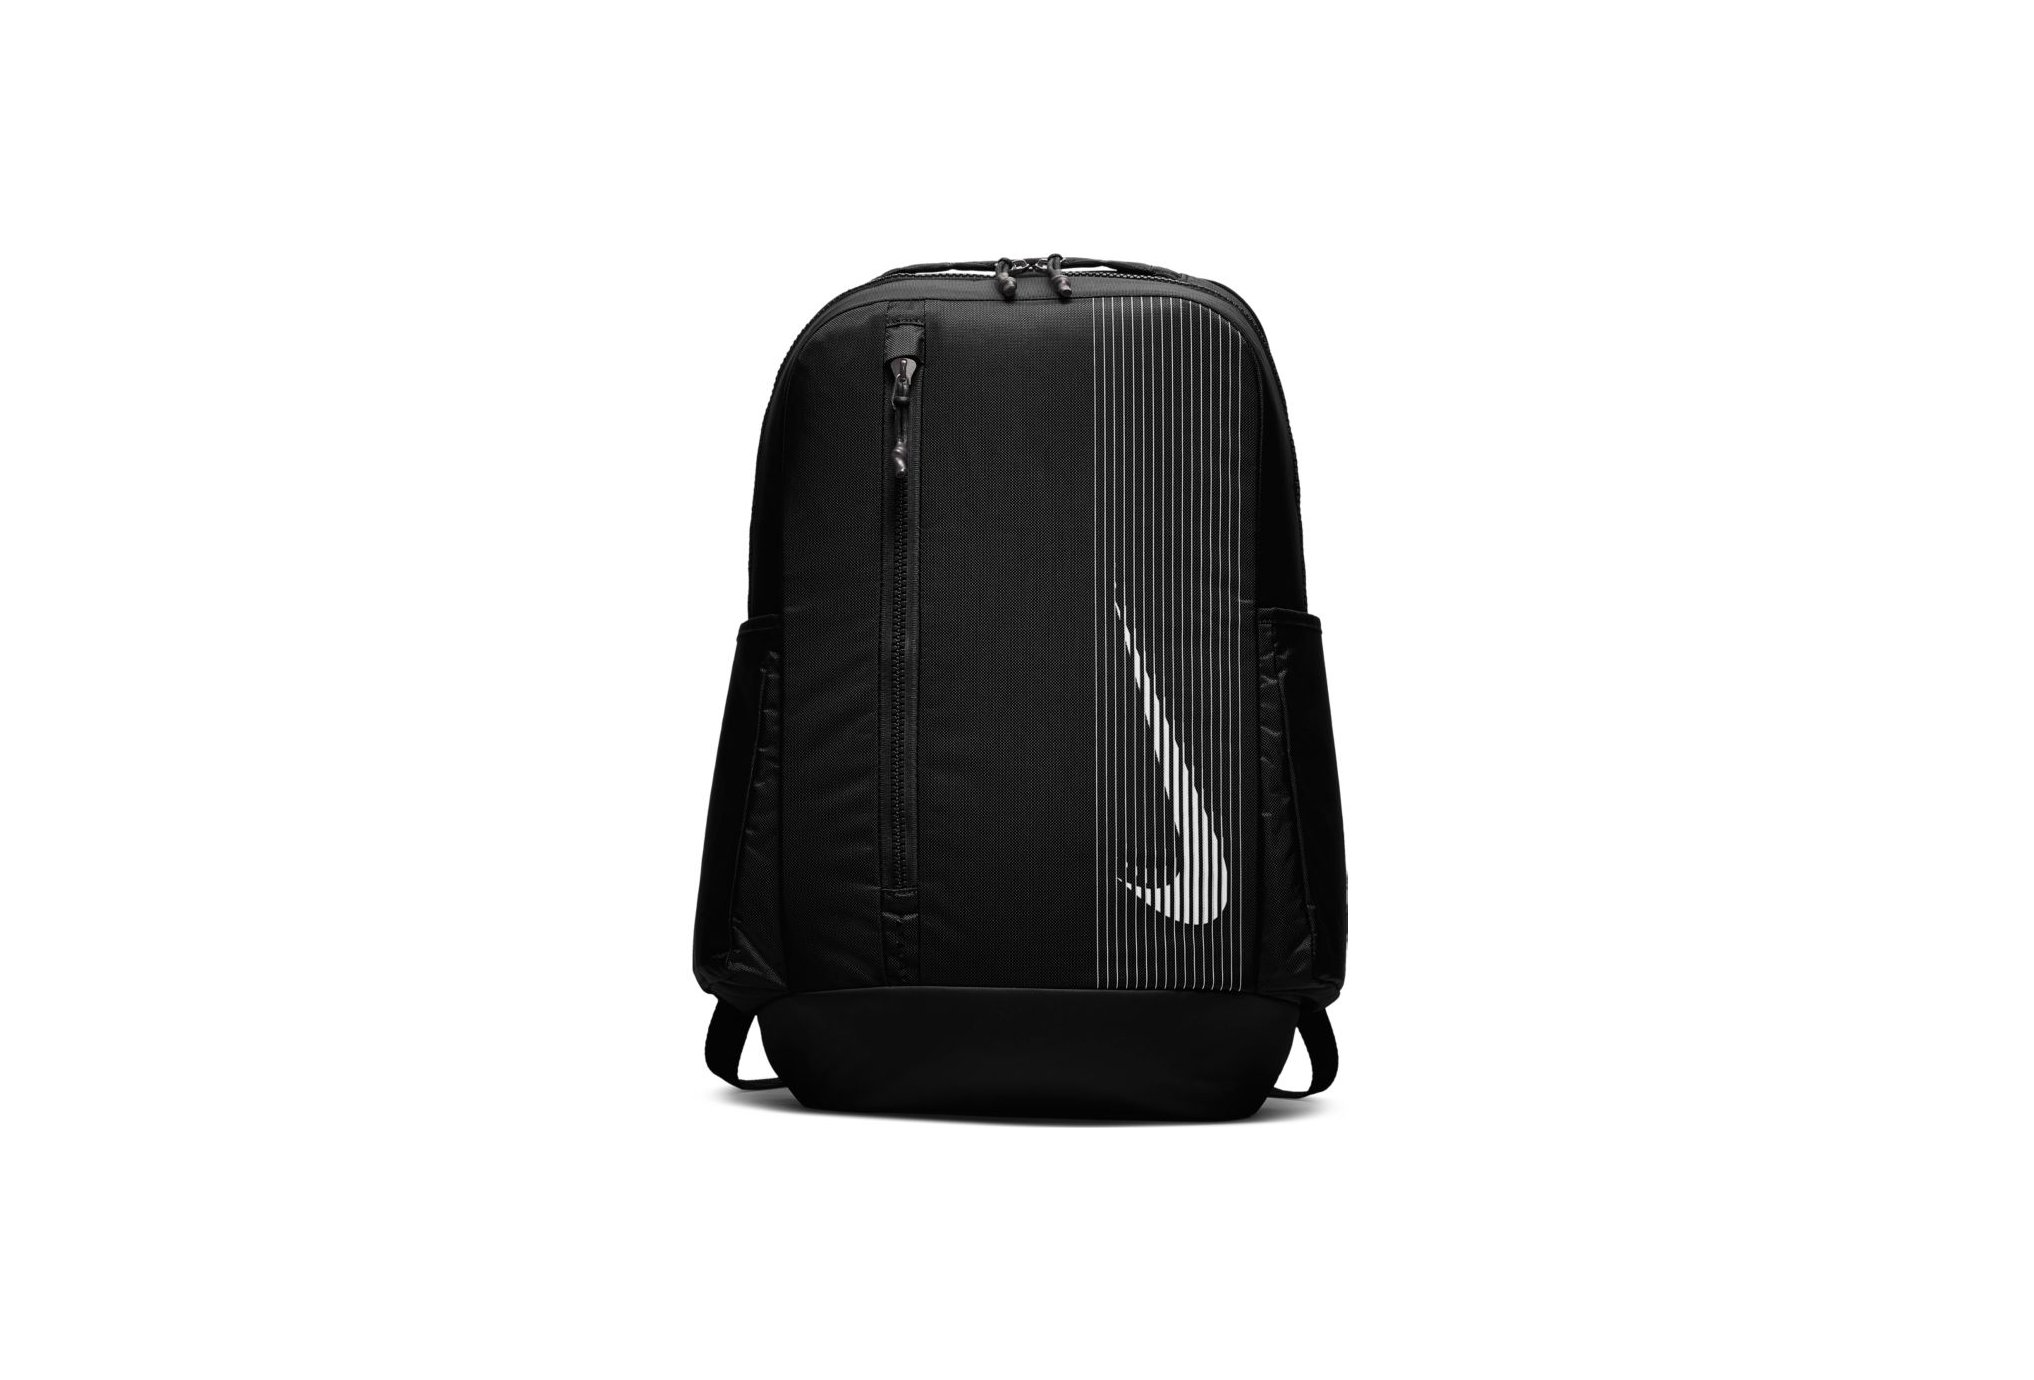 Nike Vapor Power 2.0 Backpack Sac à dos